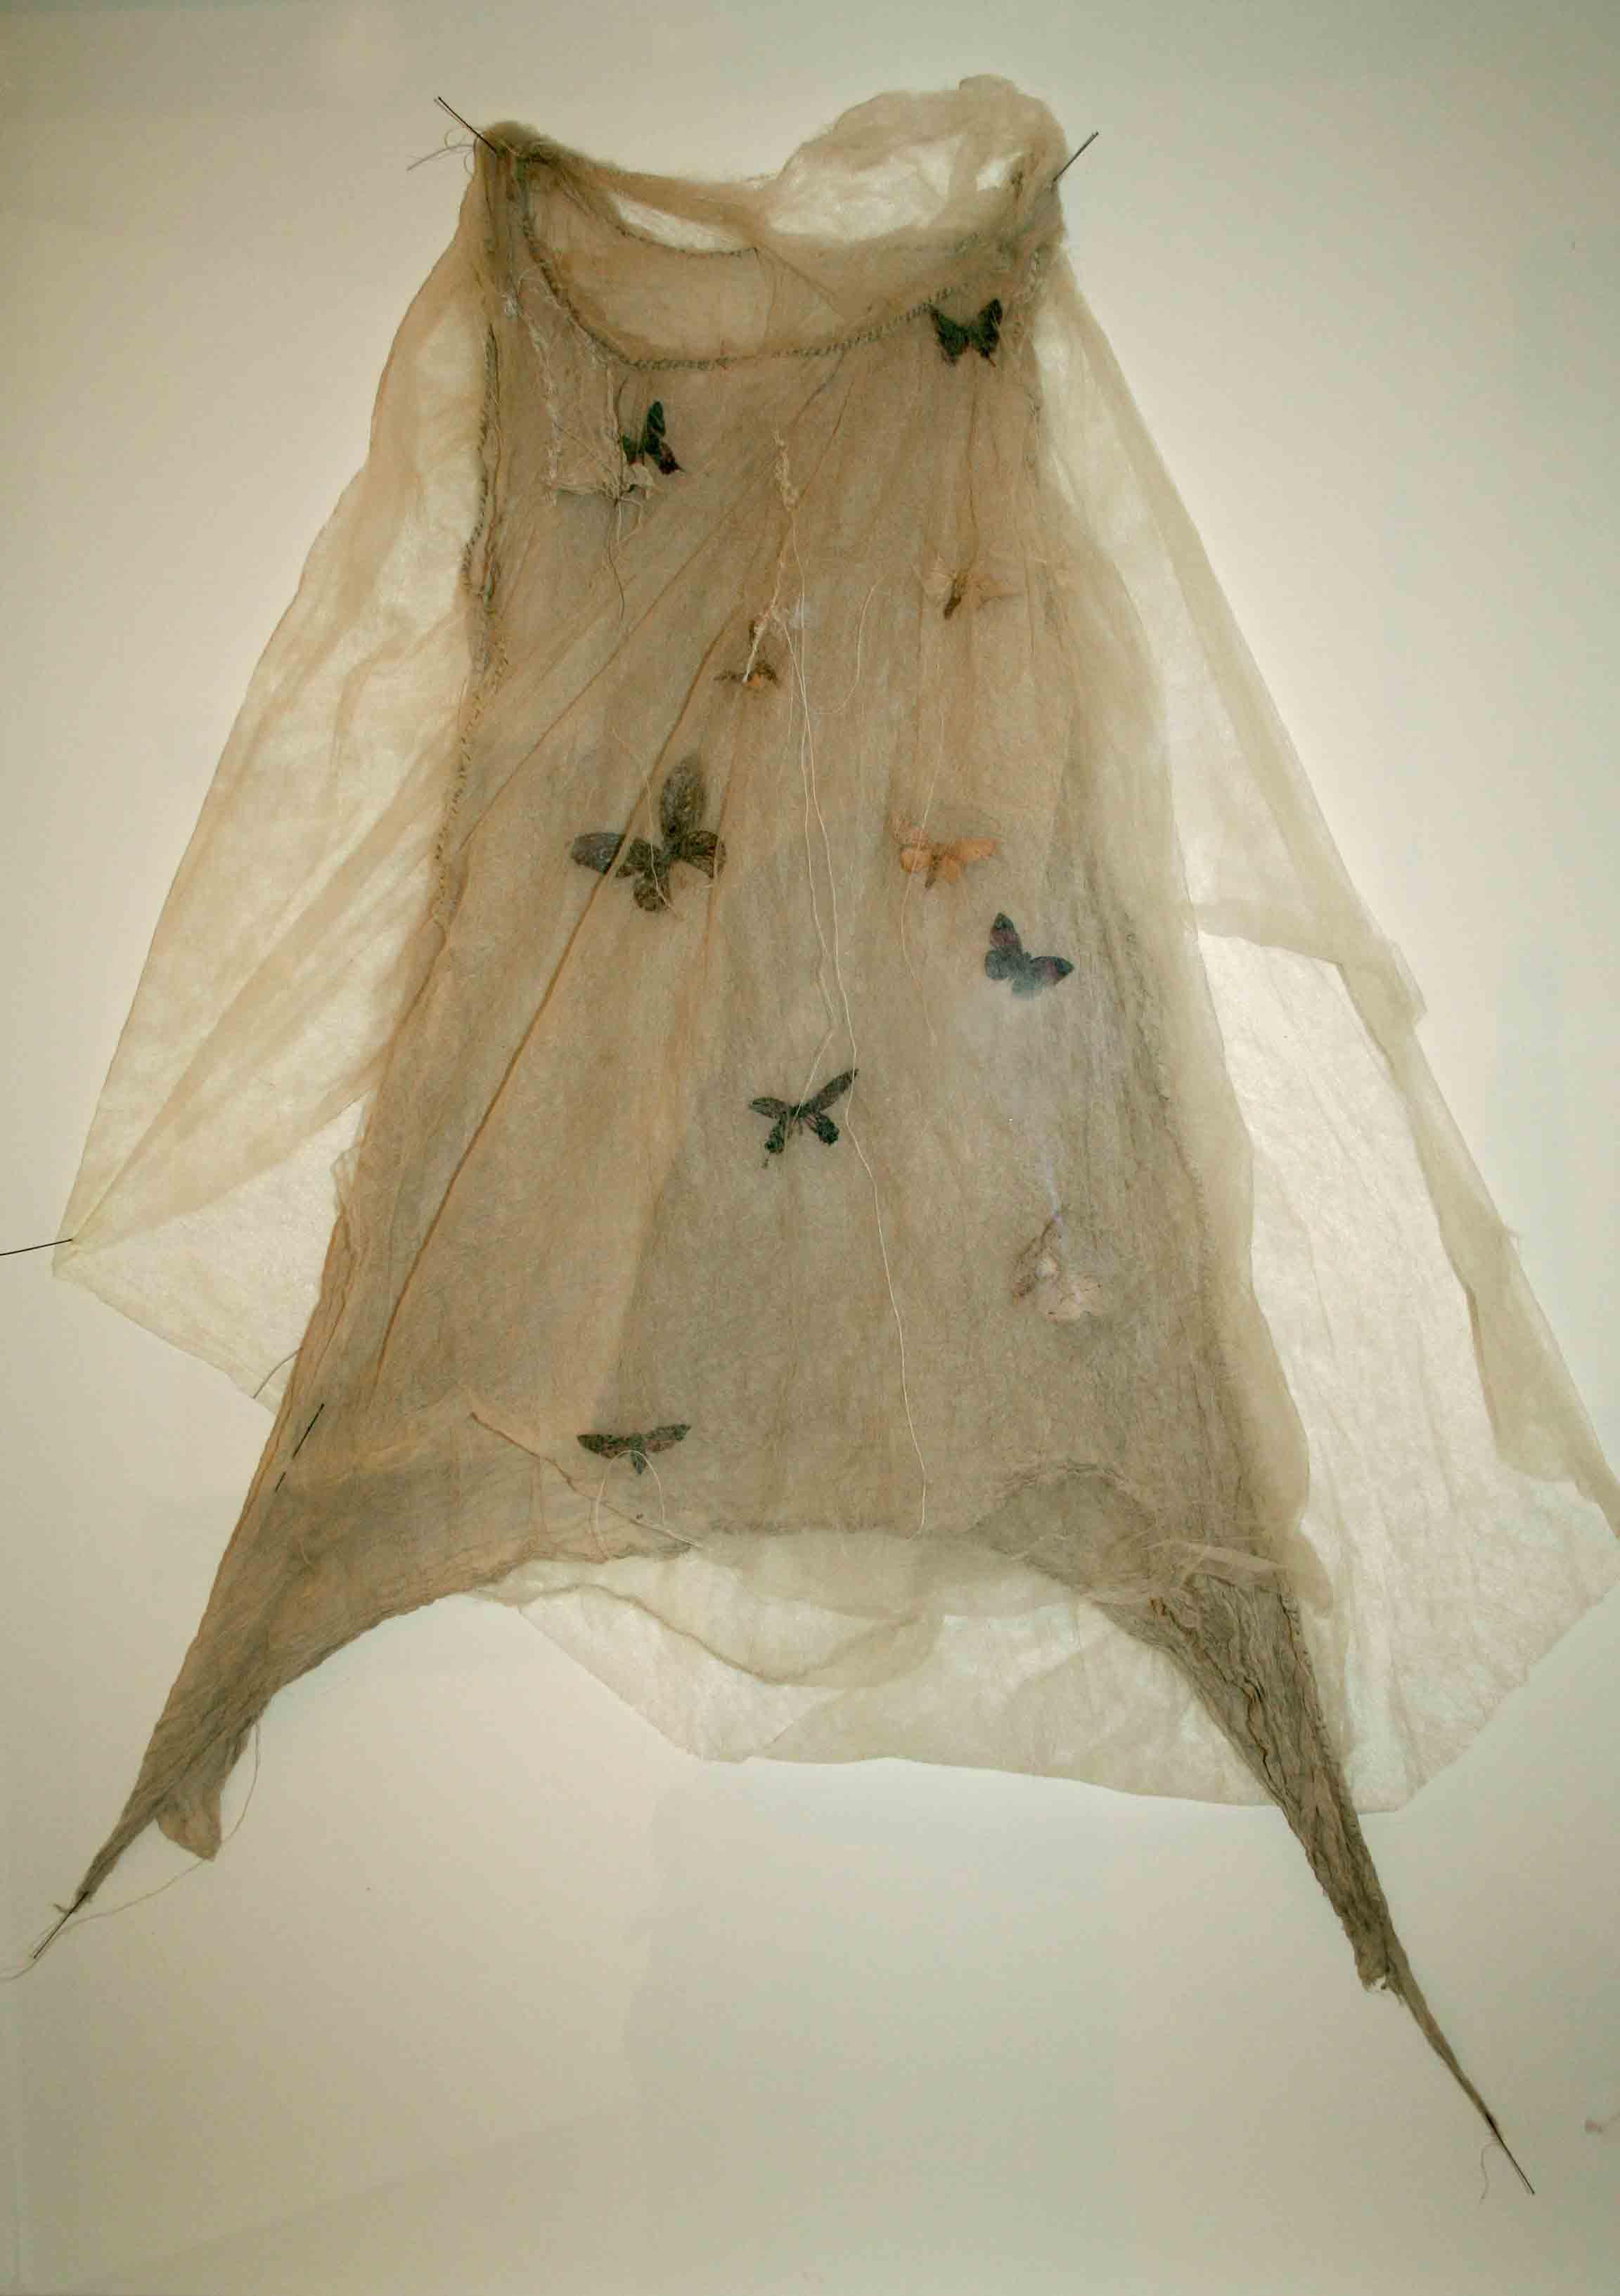 louise richardson – Night dress2 – mixed media